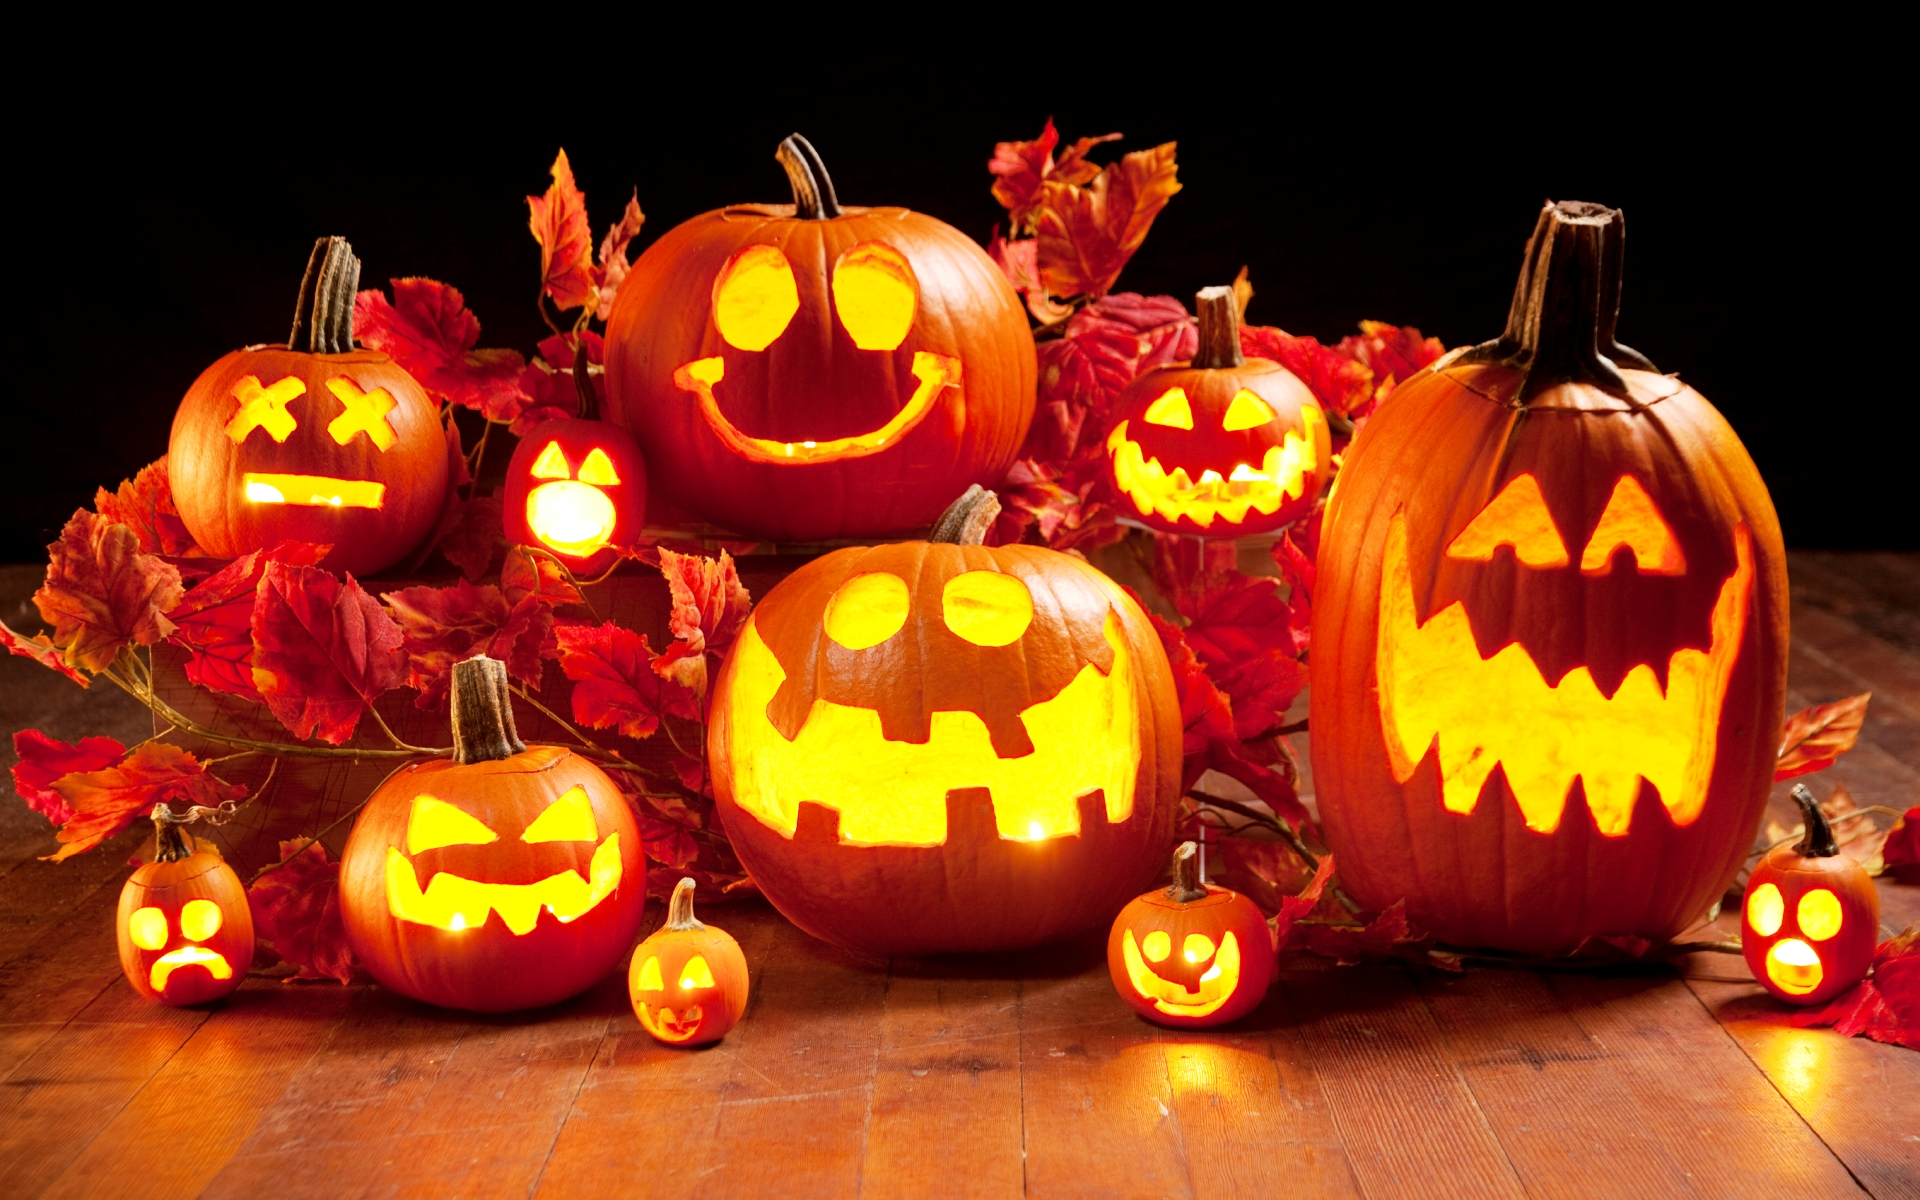 Most Inspiring Wallpaper High Quality Halloween - halloween_wallpaper_25  Best Photo Reference_234865.jpg